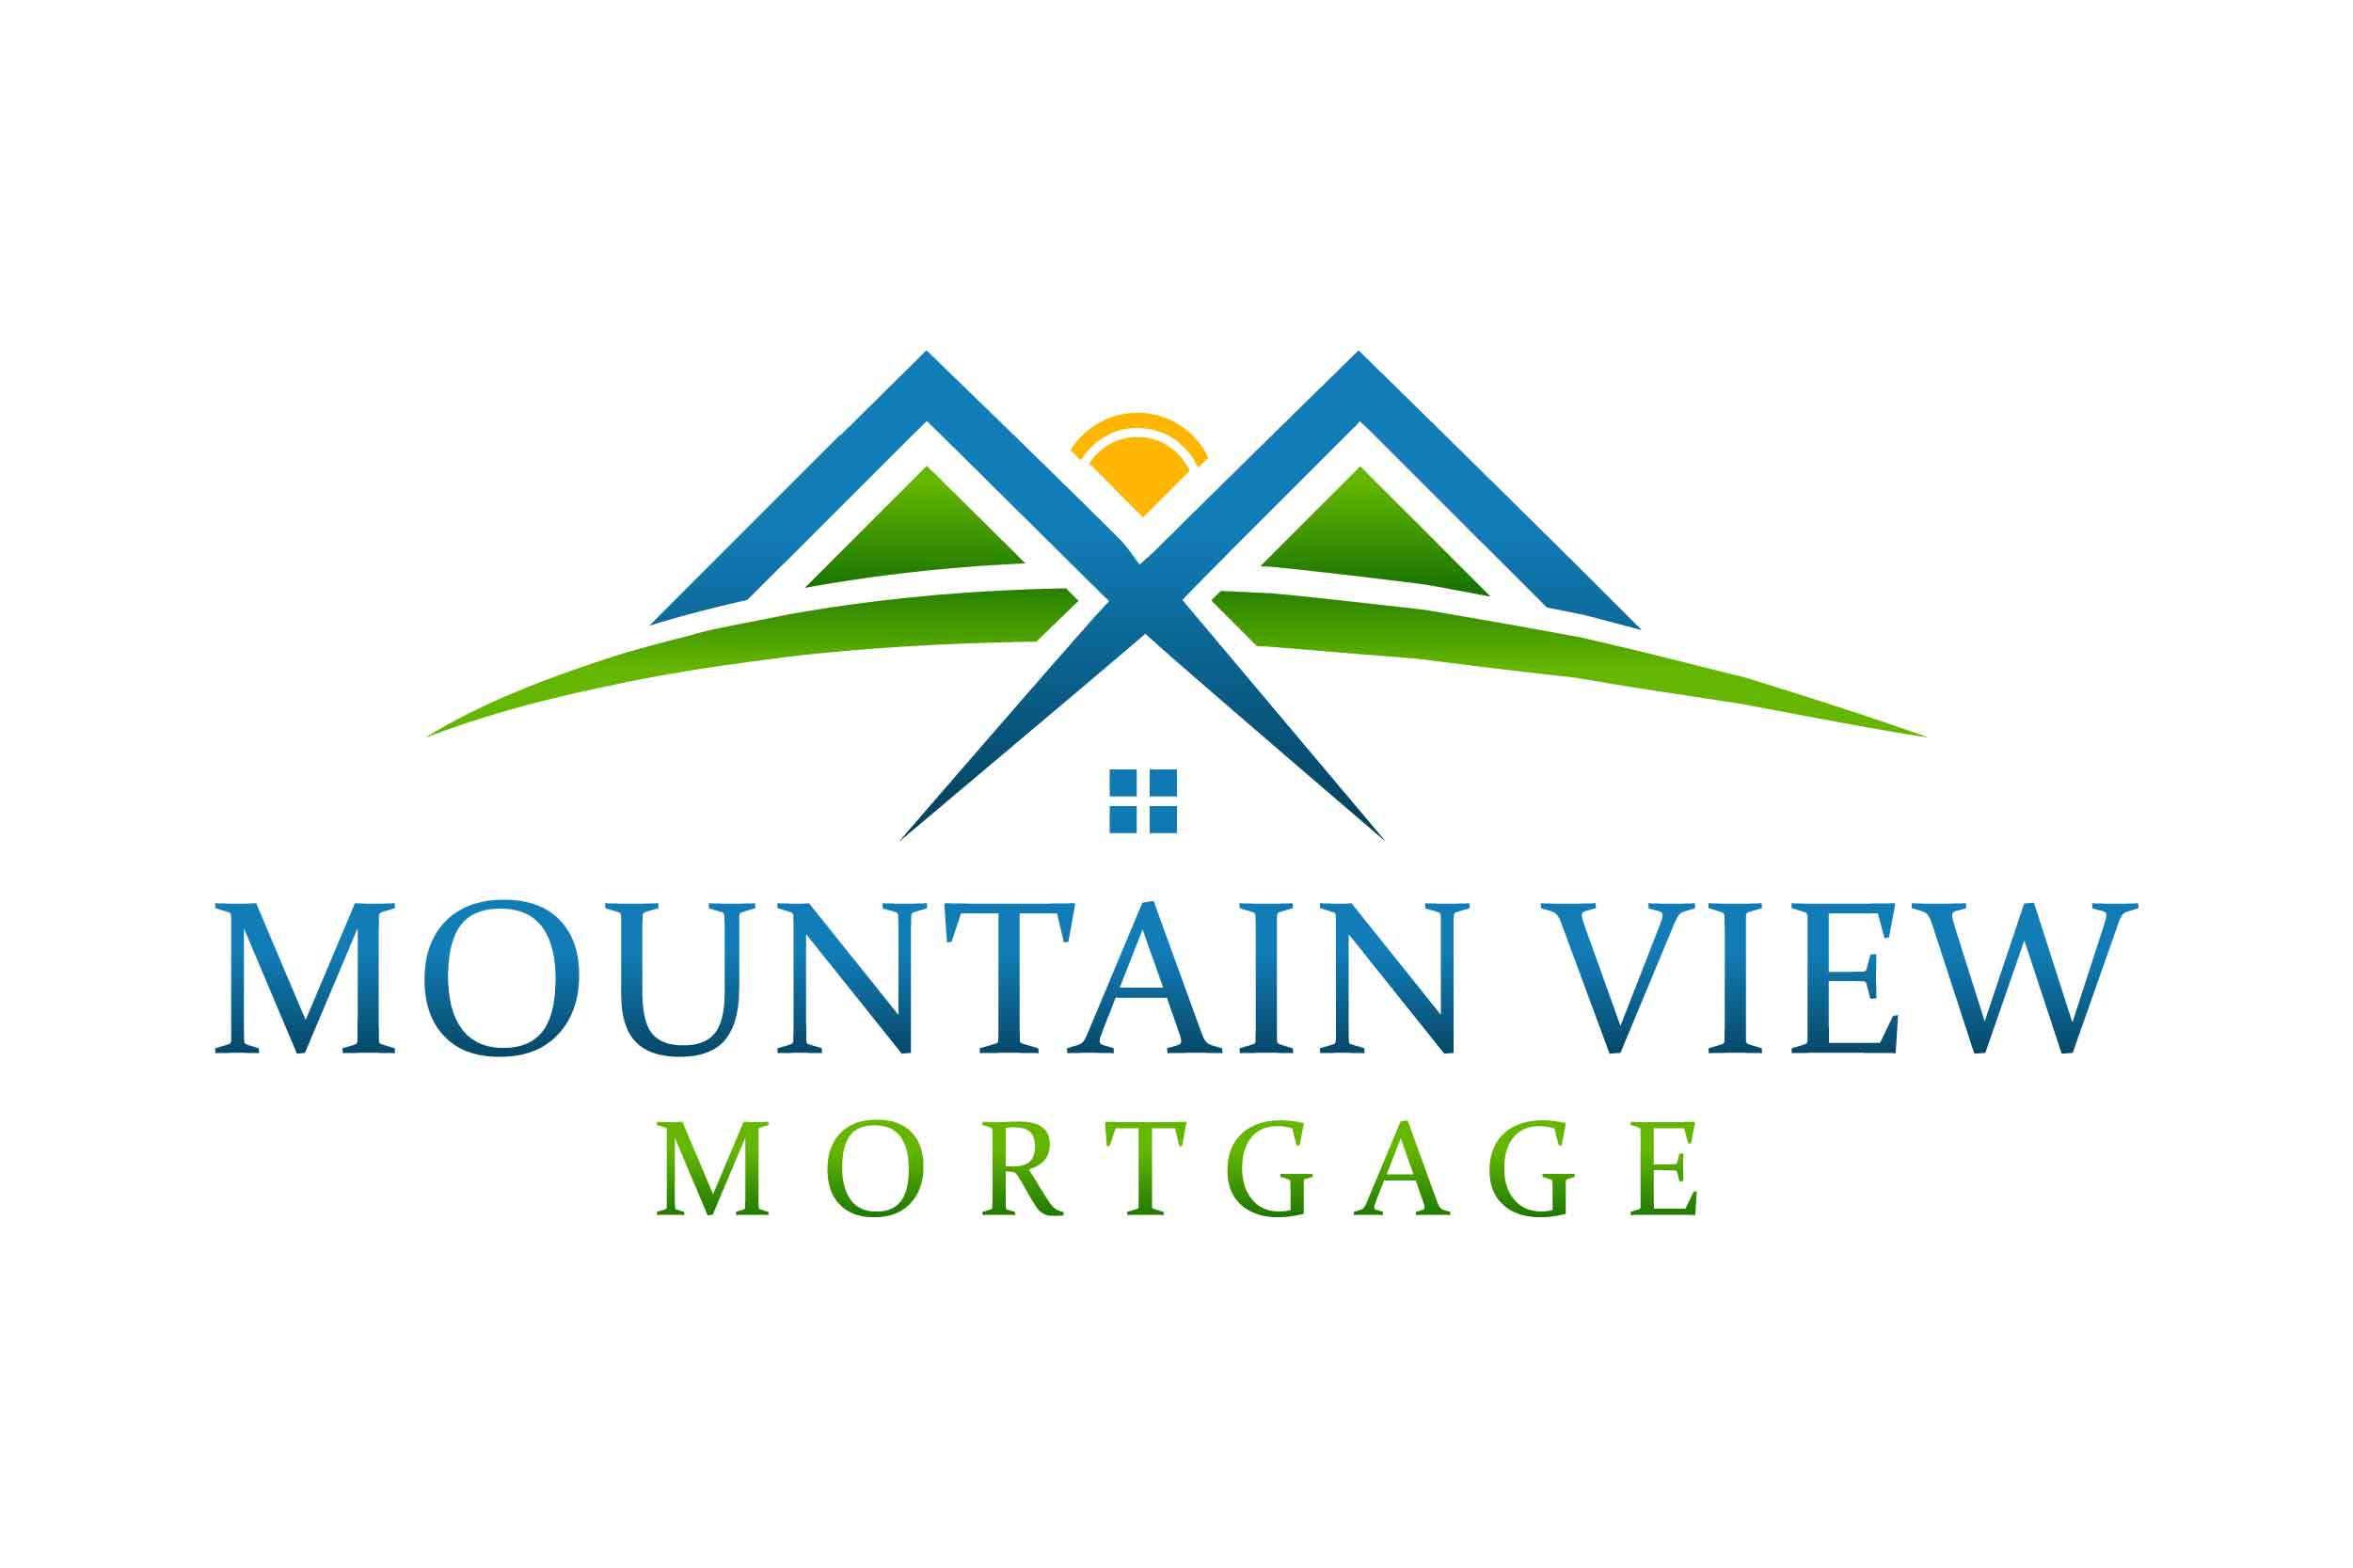 Mountain View Mortgage